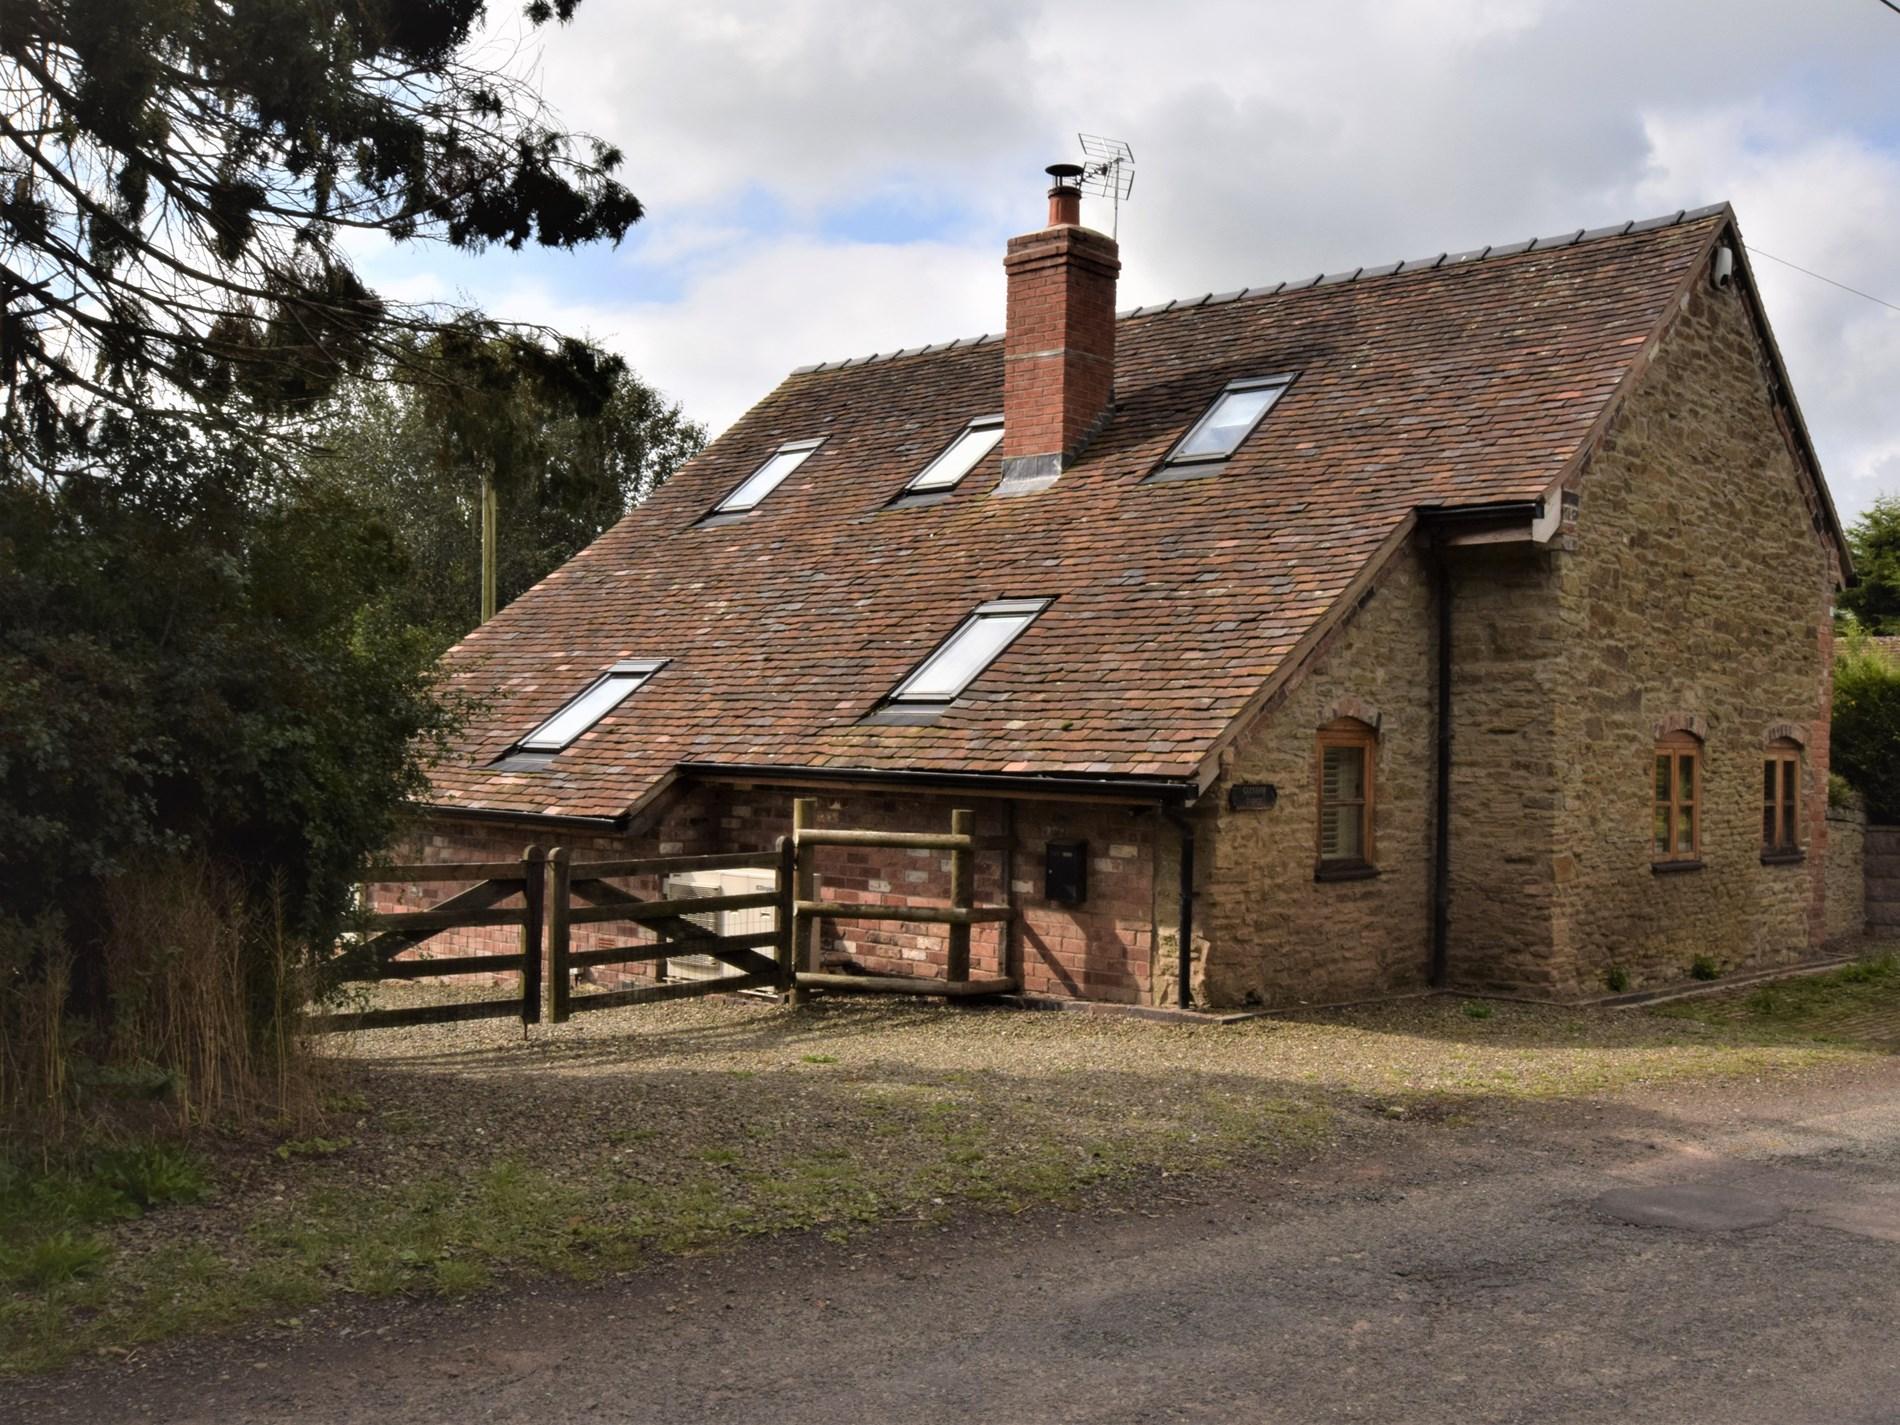 2 Bedroom Barn in Shropshire, Heart of England